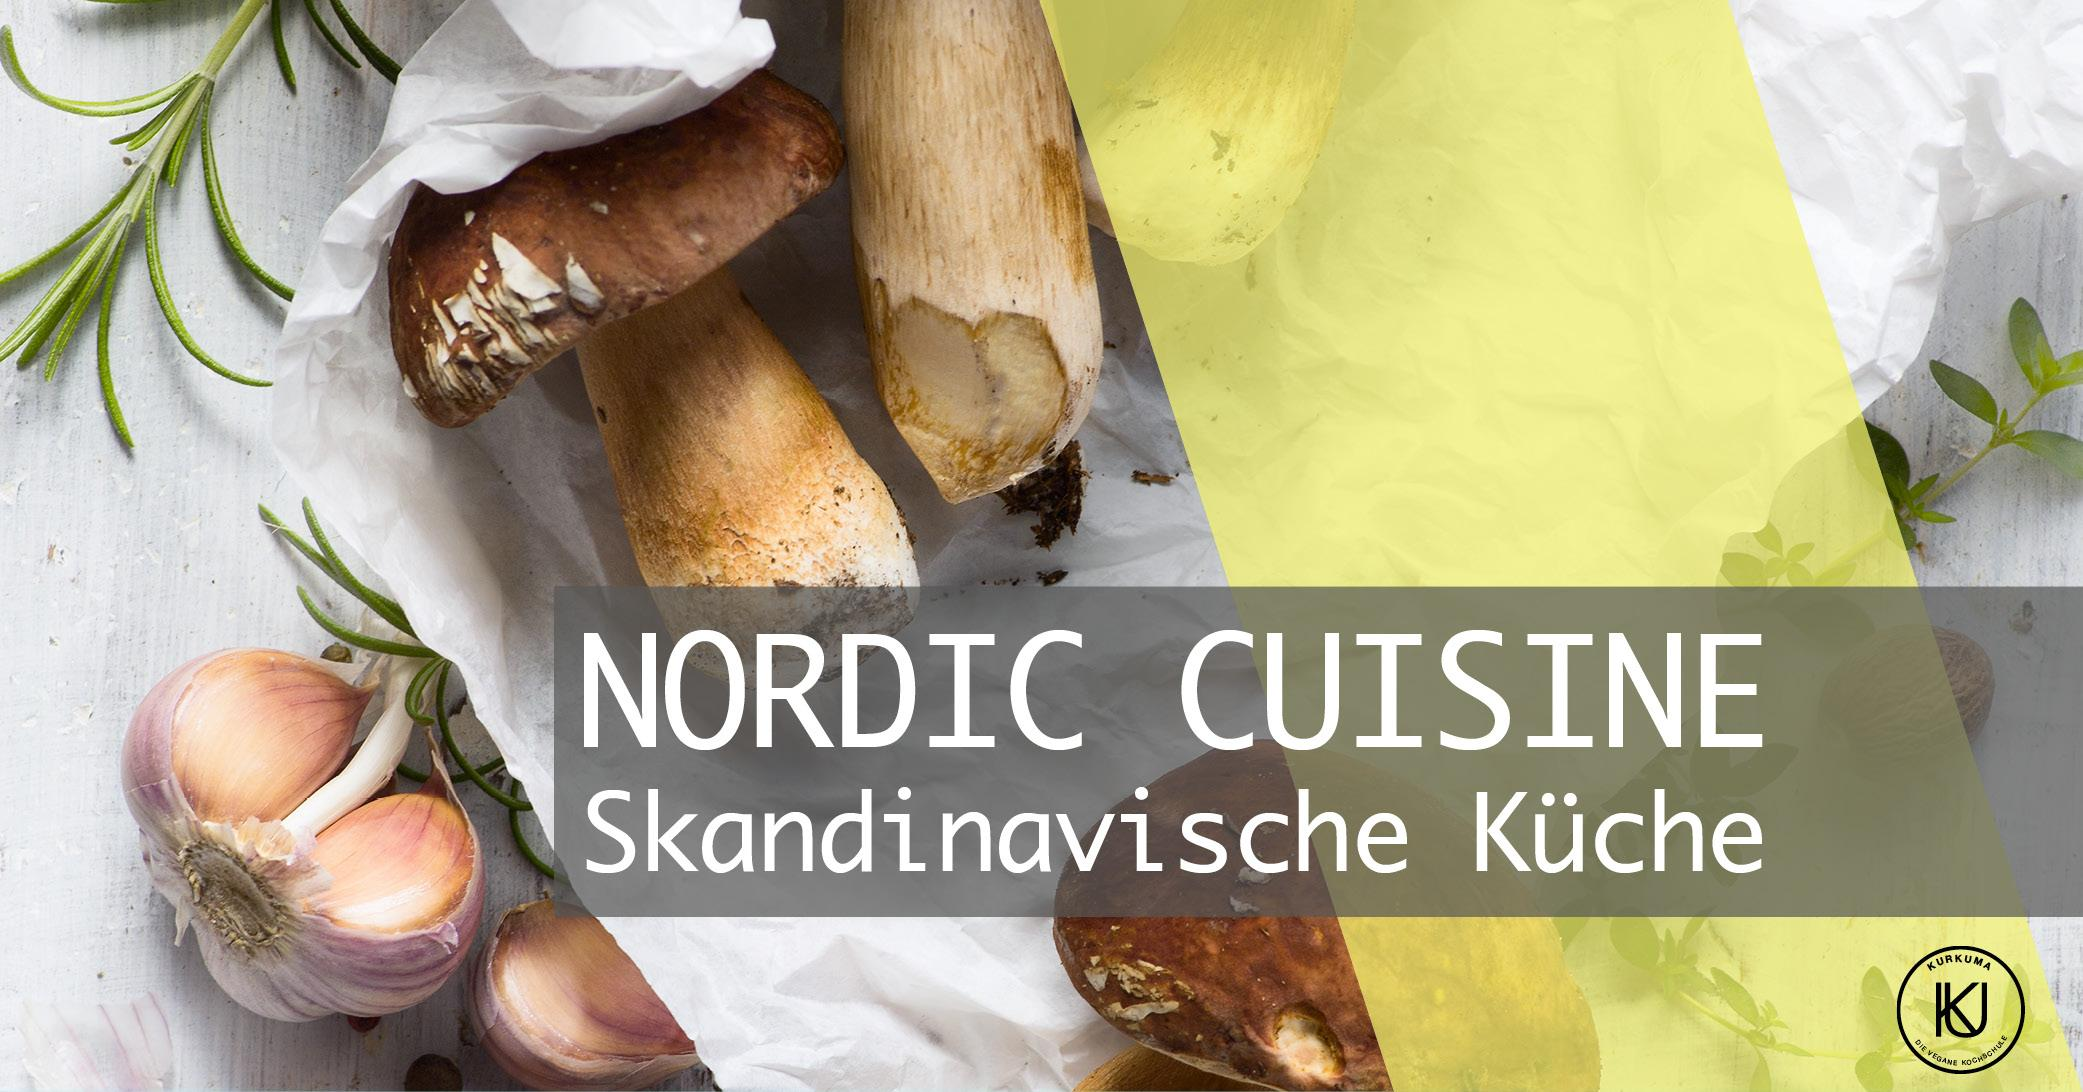 NORDIC CUISINE - Skandinavische Küche mit Corinna Krampe